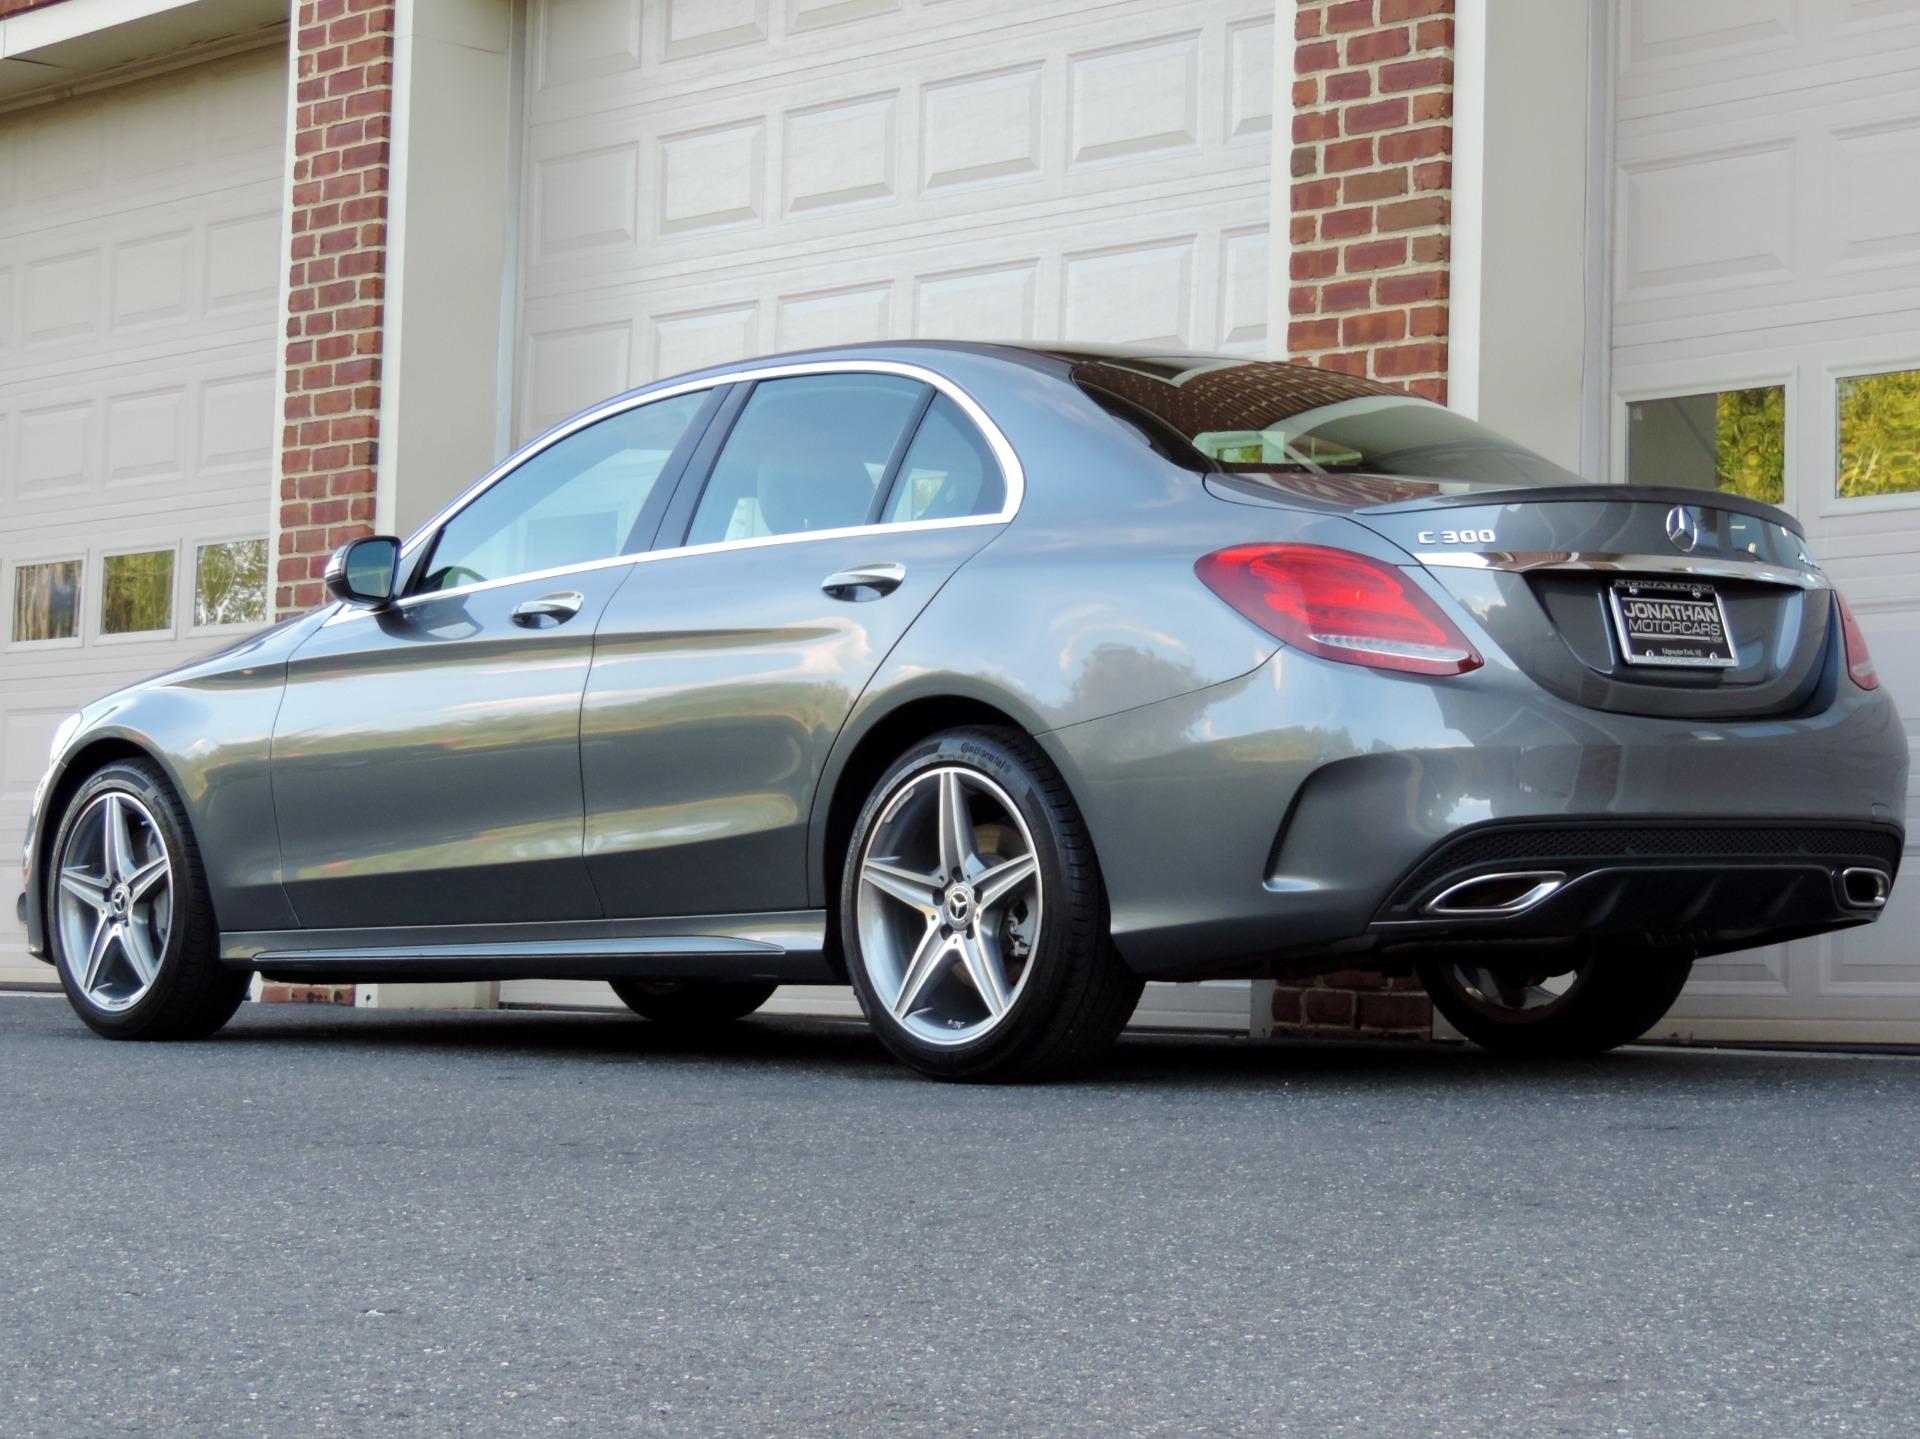 Mercedes Benz Dealers In Nj >> 2018 Mercedes-Benz C-Class C 300 4MATIC Sport Stock ...